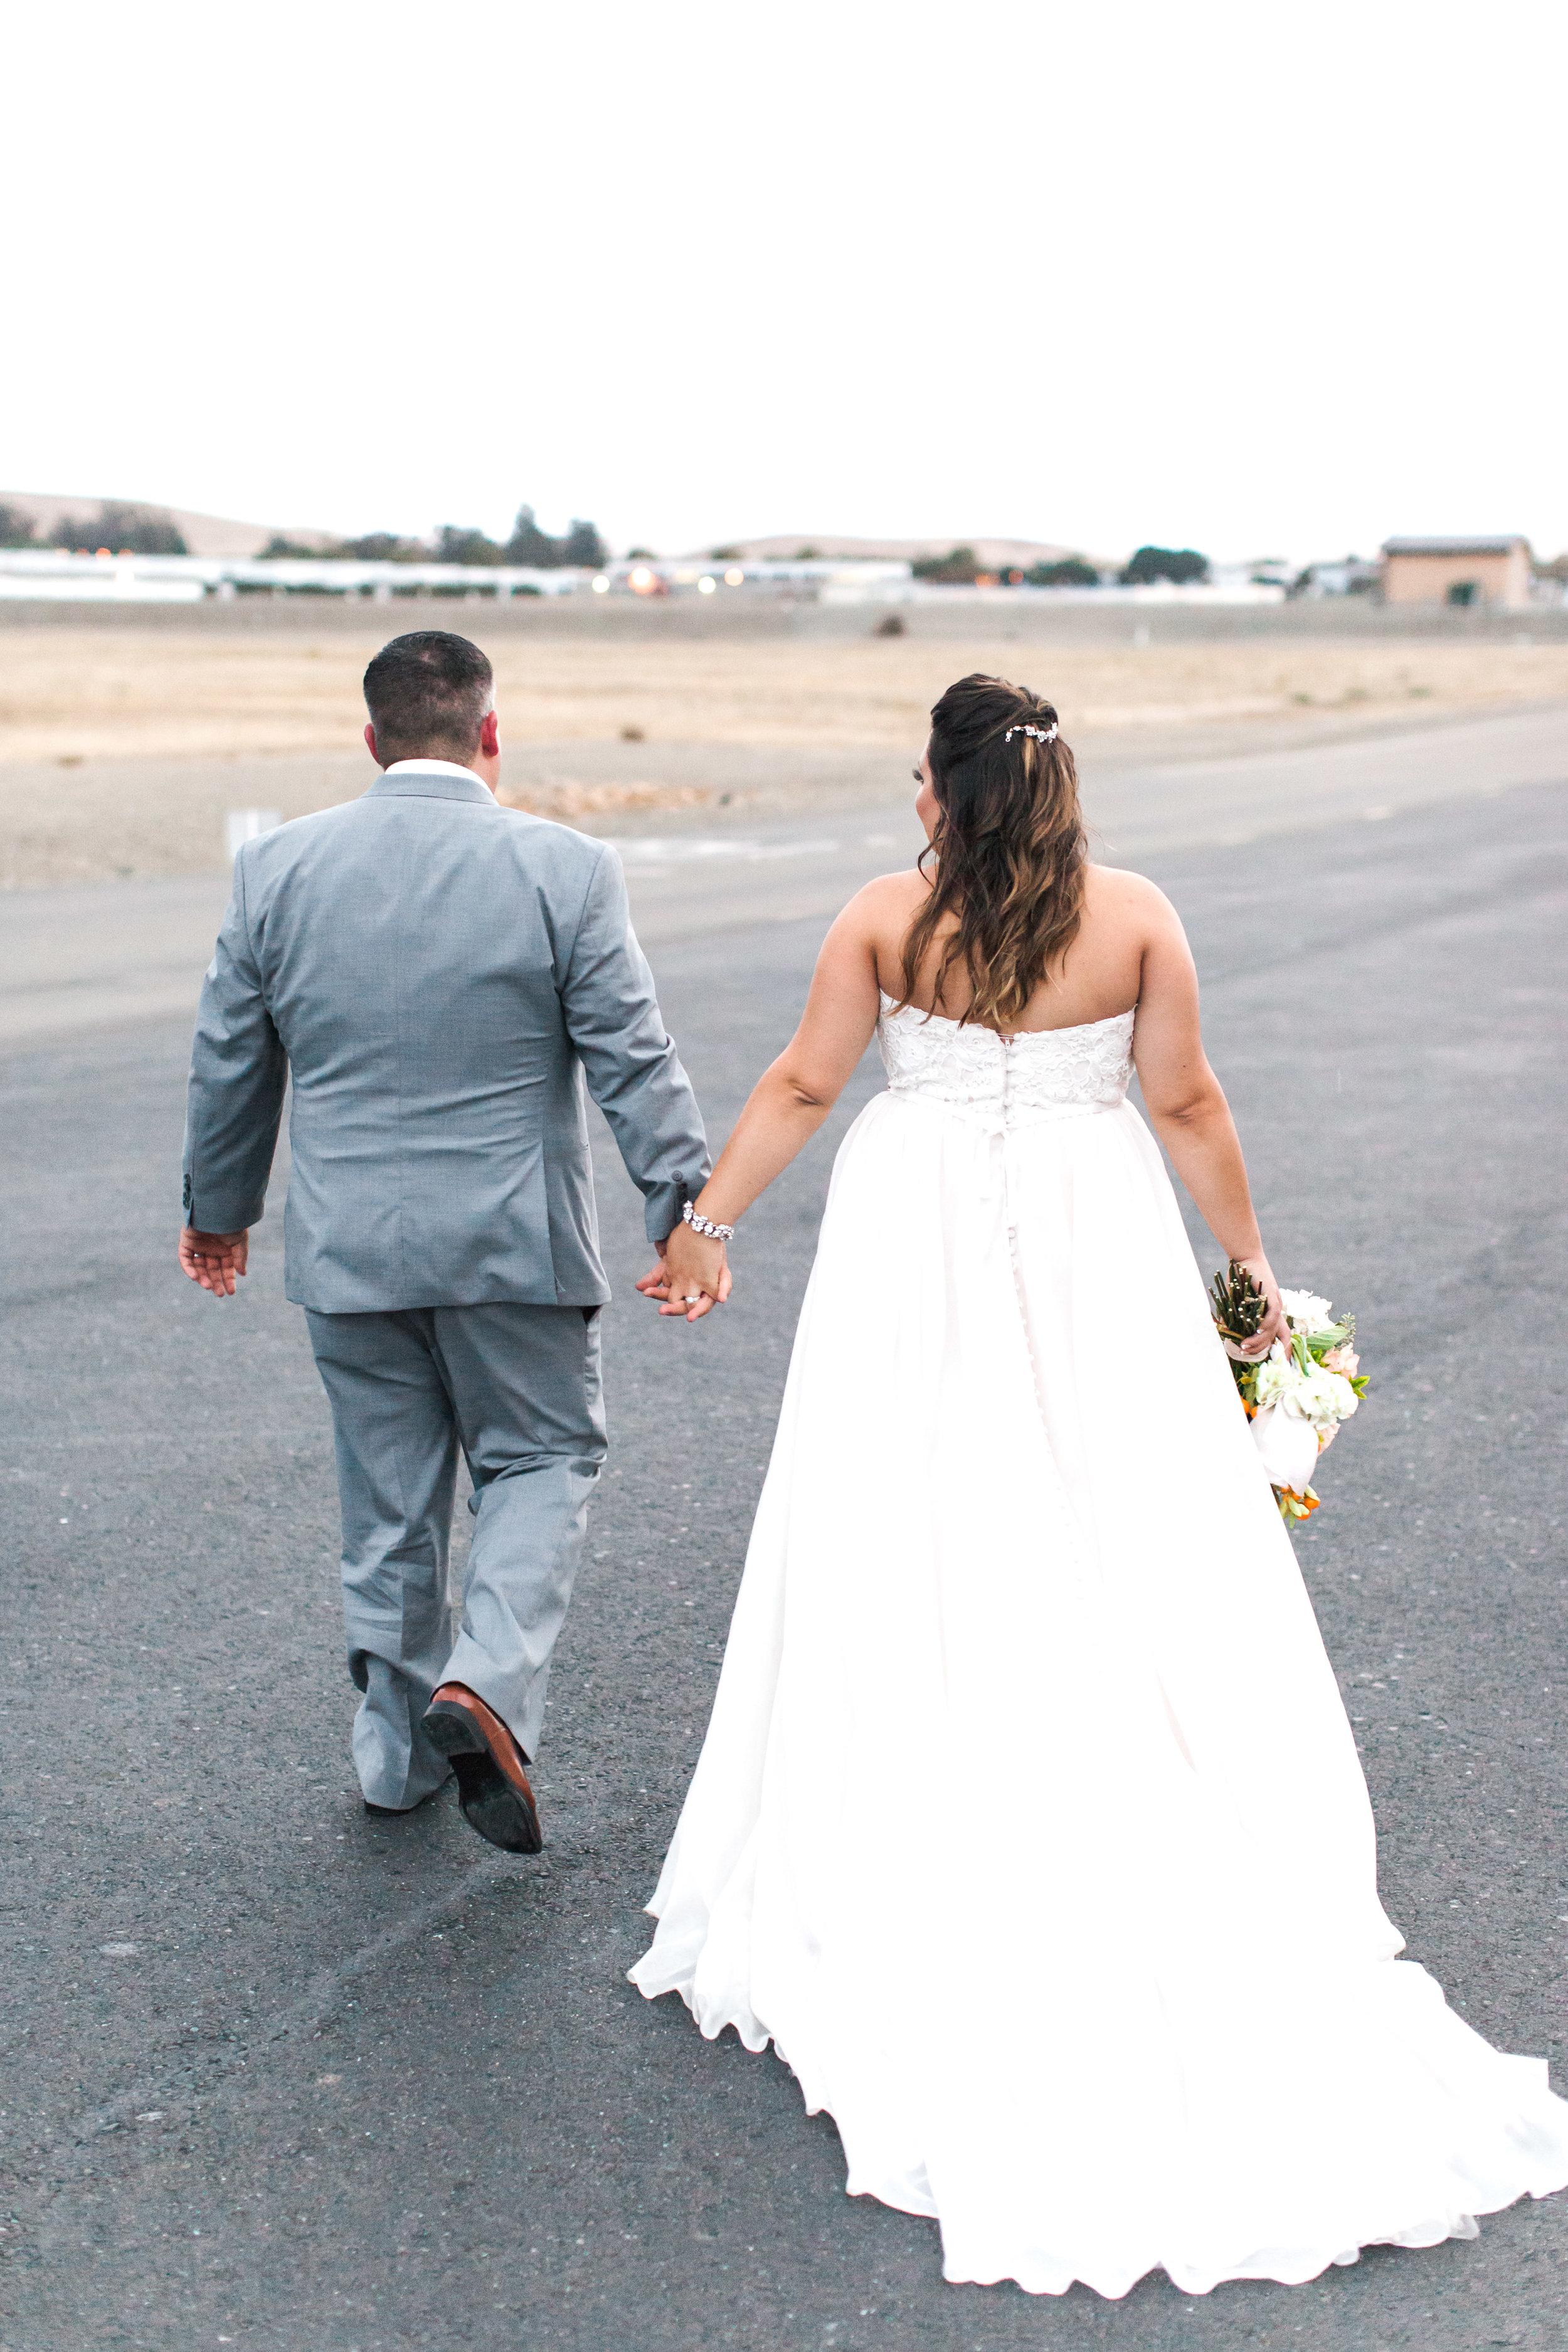 airport-hanger-wedding-at-attitude-aviation-in-livermore-113.jpg